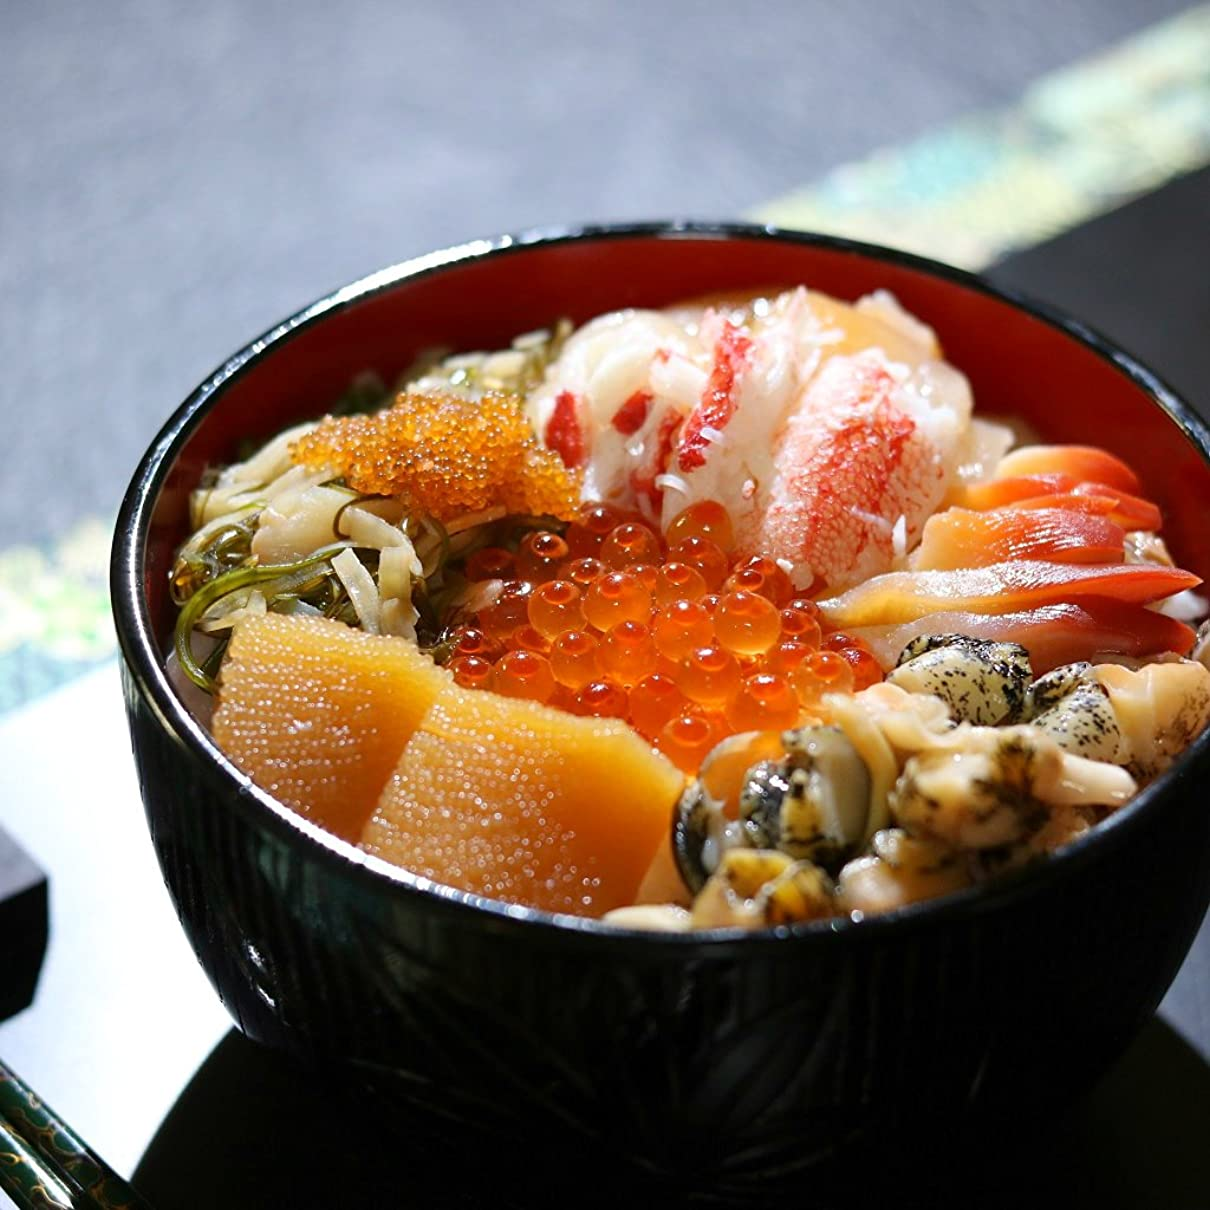 毛細血管文房具麺松前漬け 海の幸 海鮮10種入 270g 北海道 海鮮 松前漬け